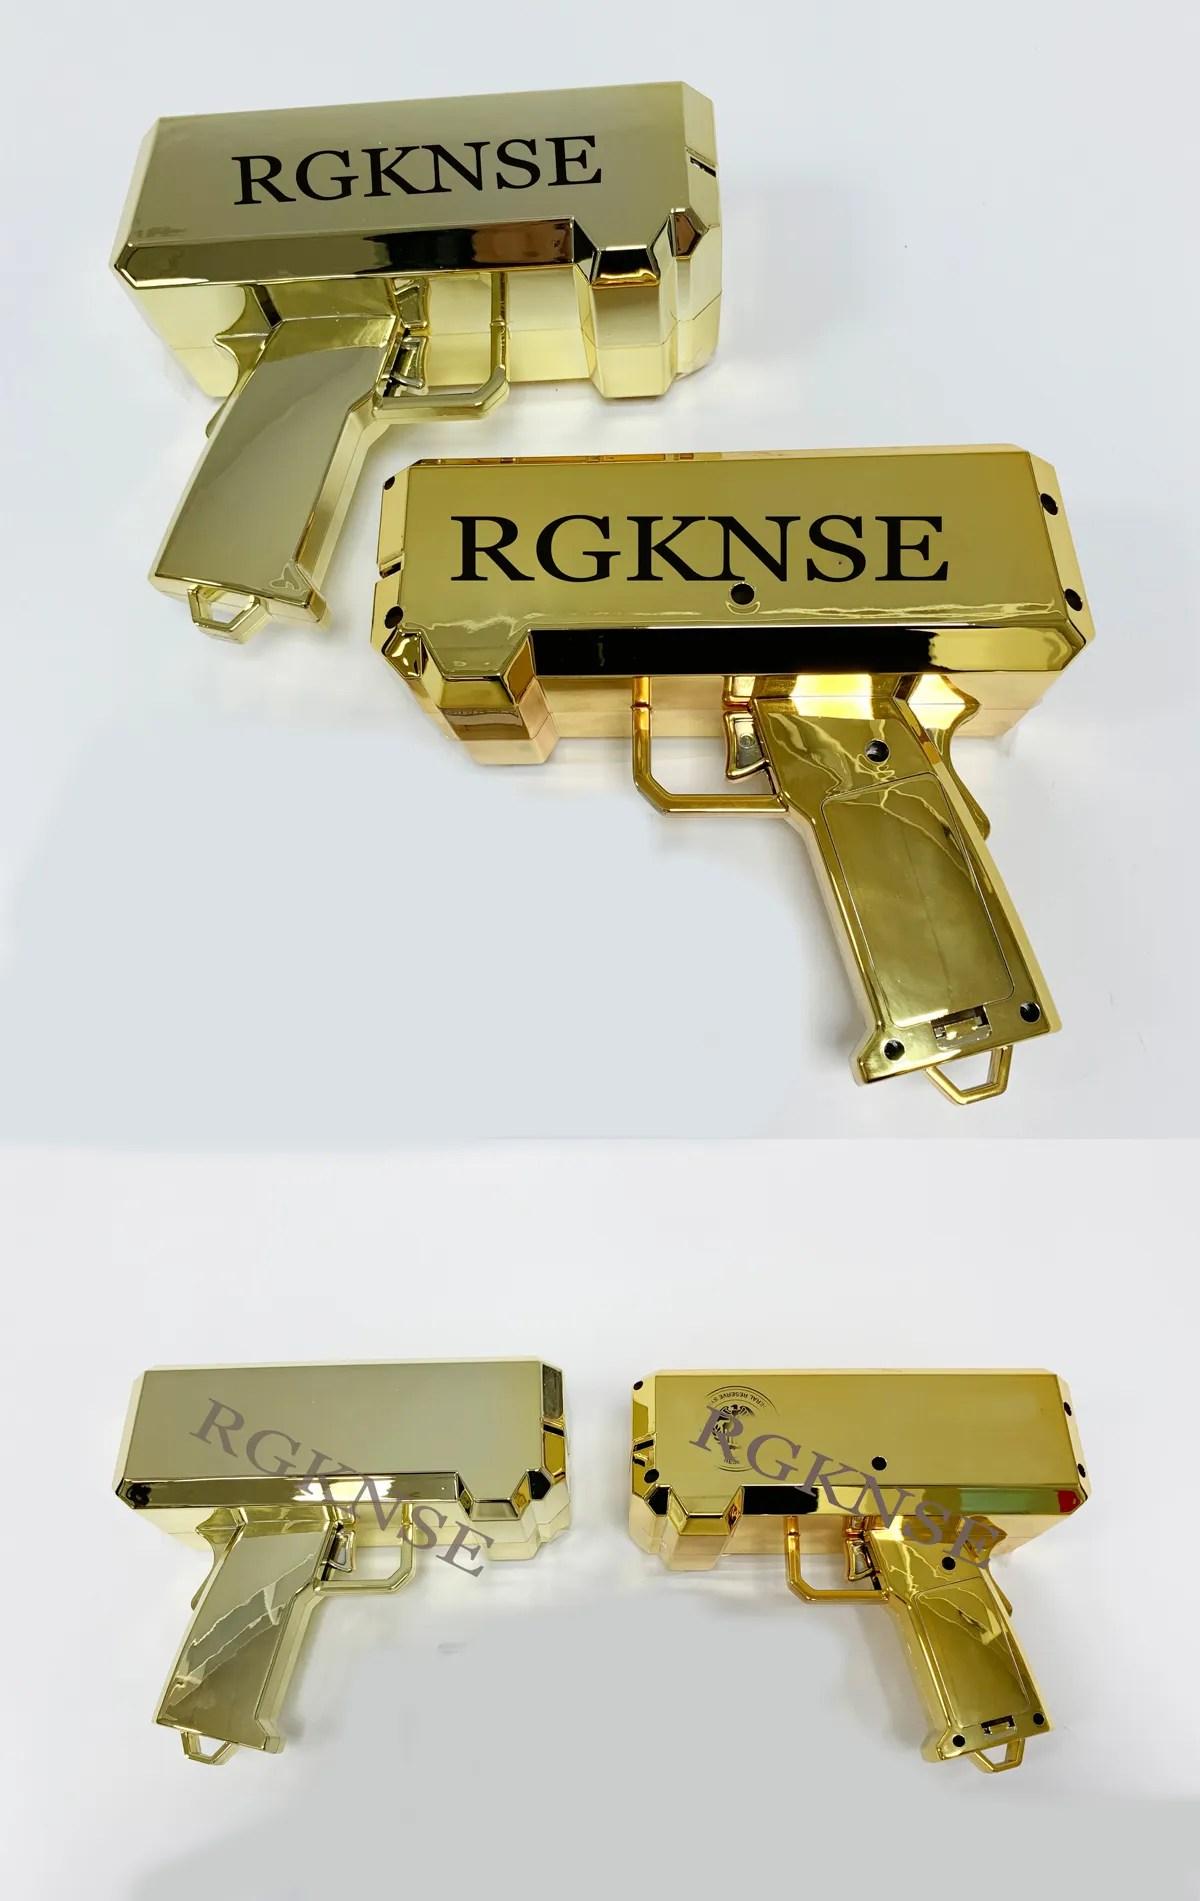 Money Gun: 'Make It Rain' Money Dispensing Cannon Gun